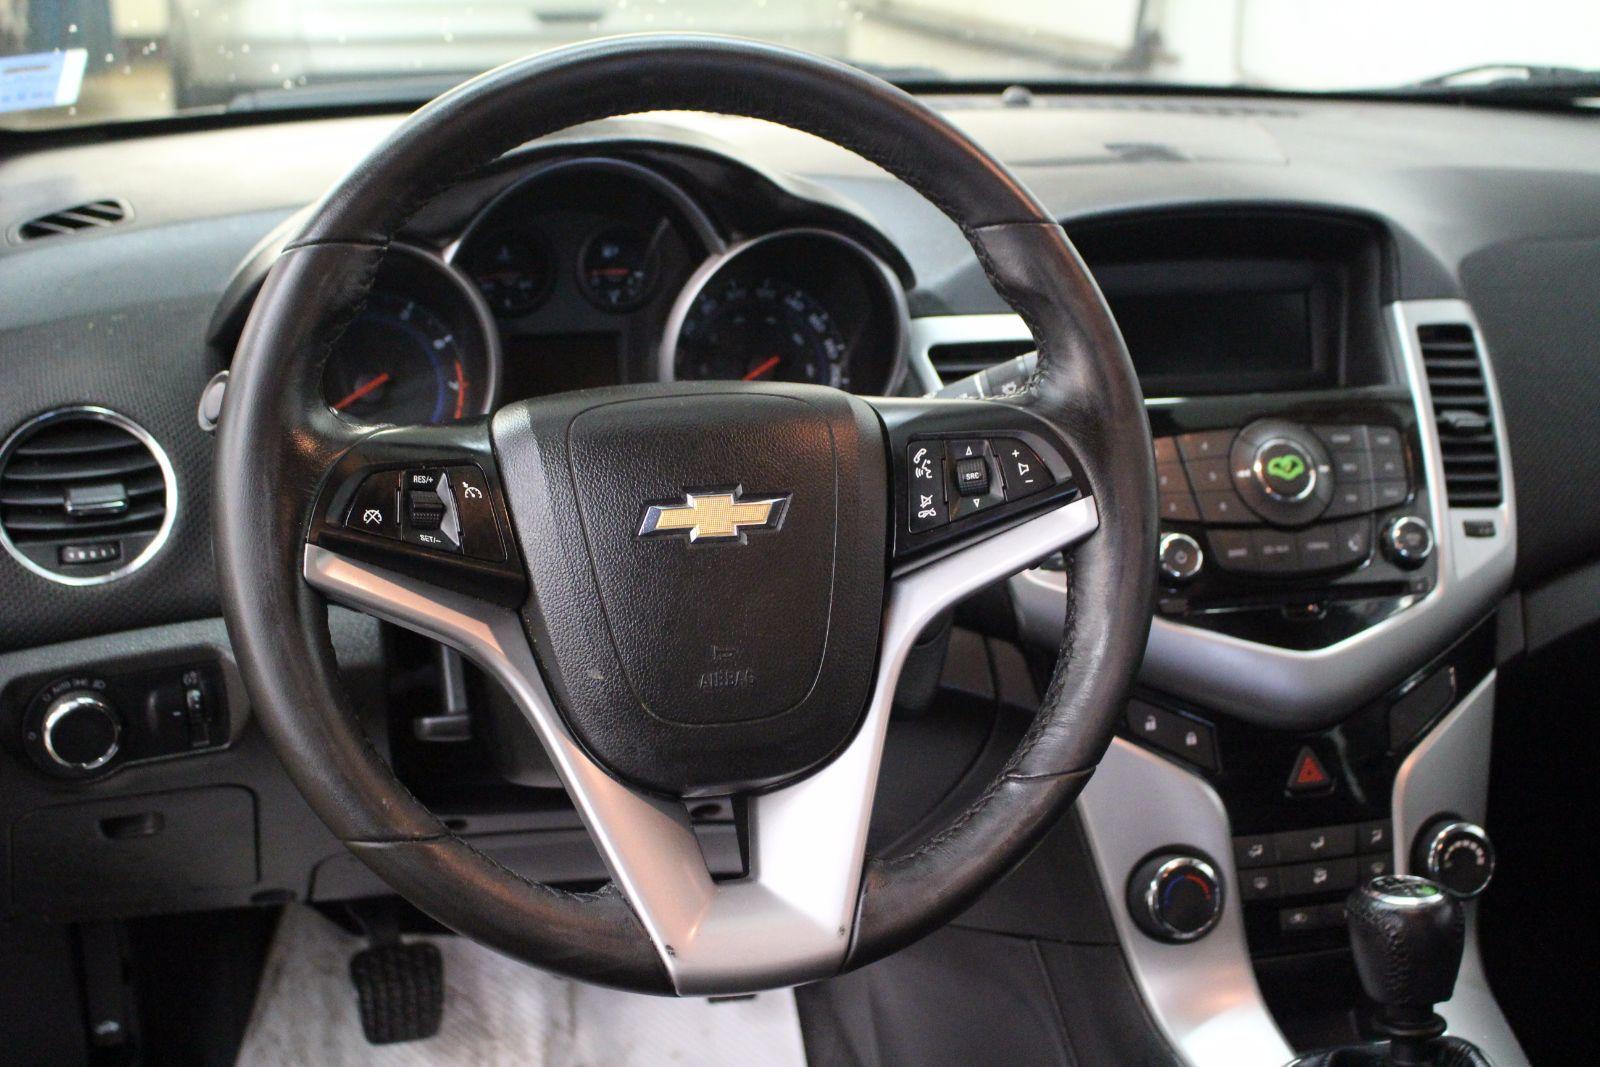 2014 chevrolet cruze eco 1 4l 4 cyl turbocharged 6 spd manual 4d sedan for sale pre owned. Black Bedroom Furniture Sets. Home Design Ideas